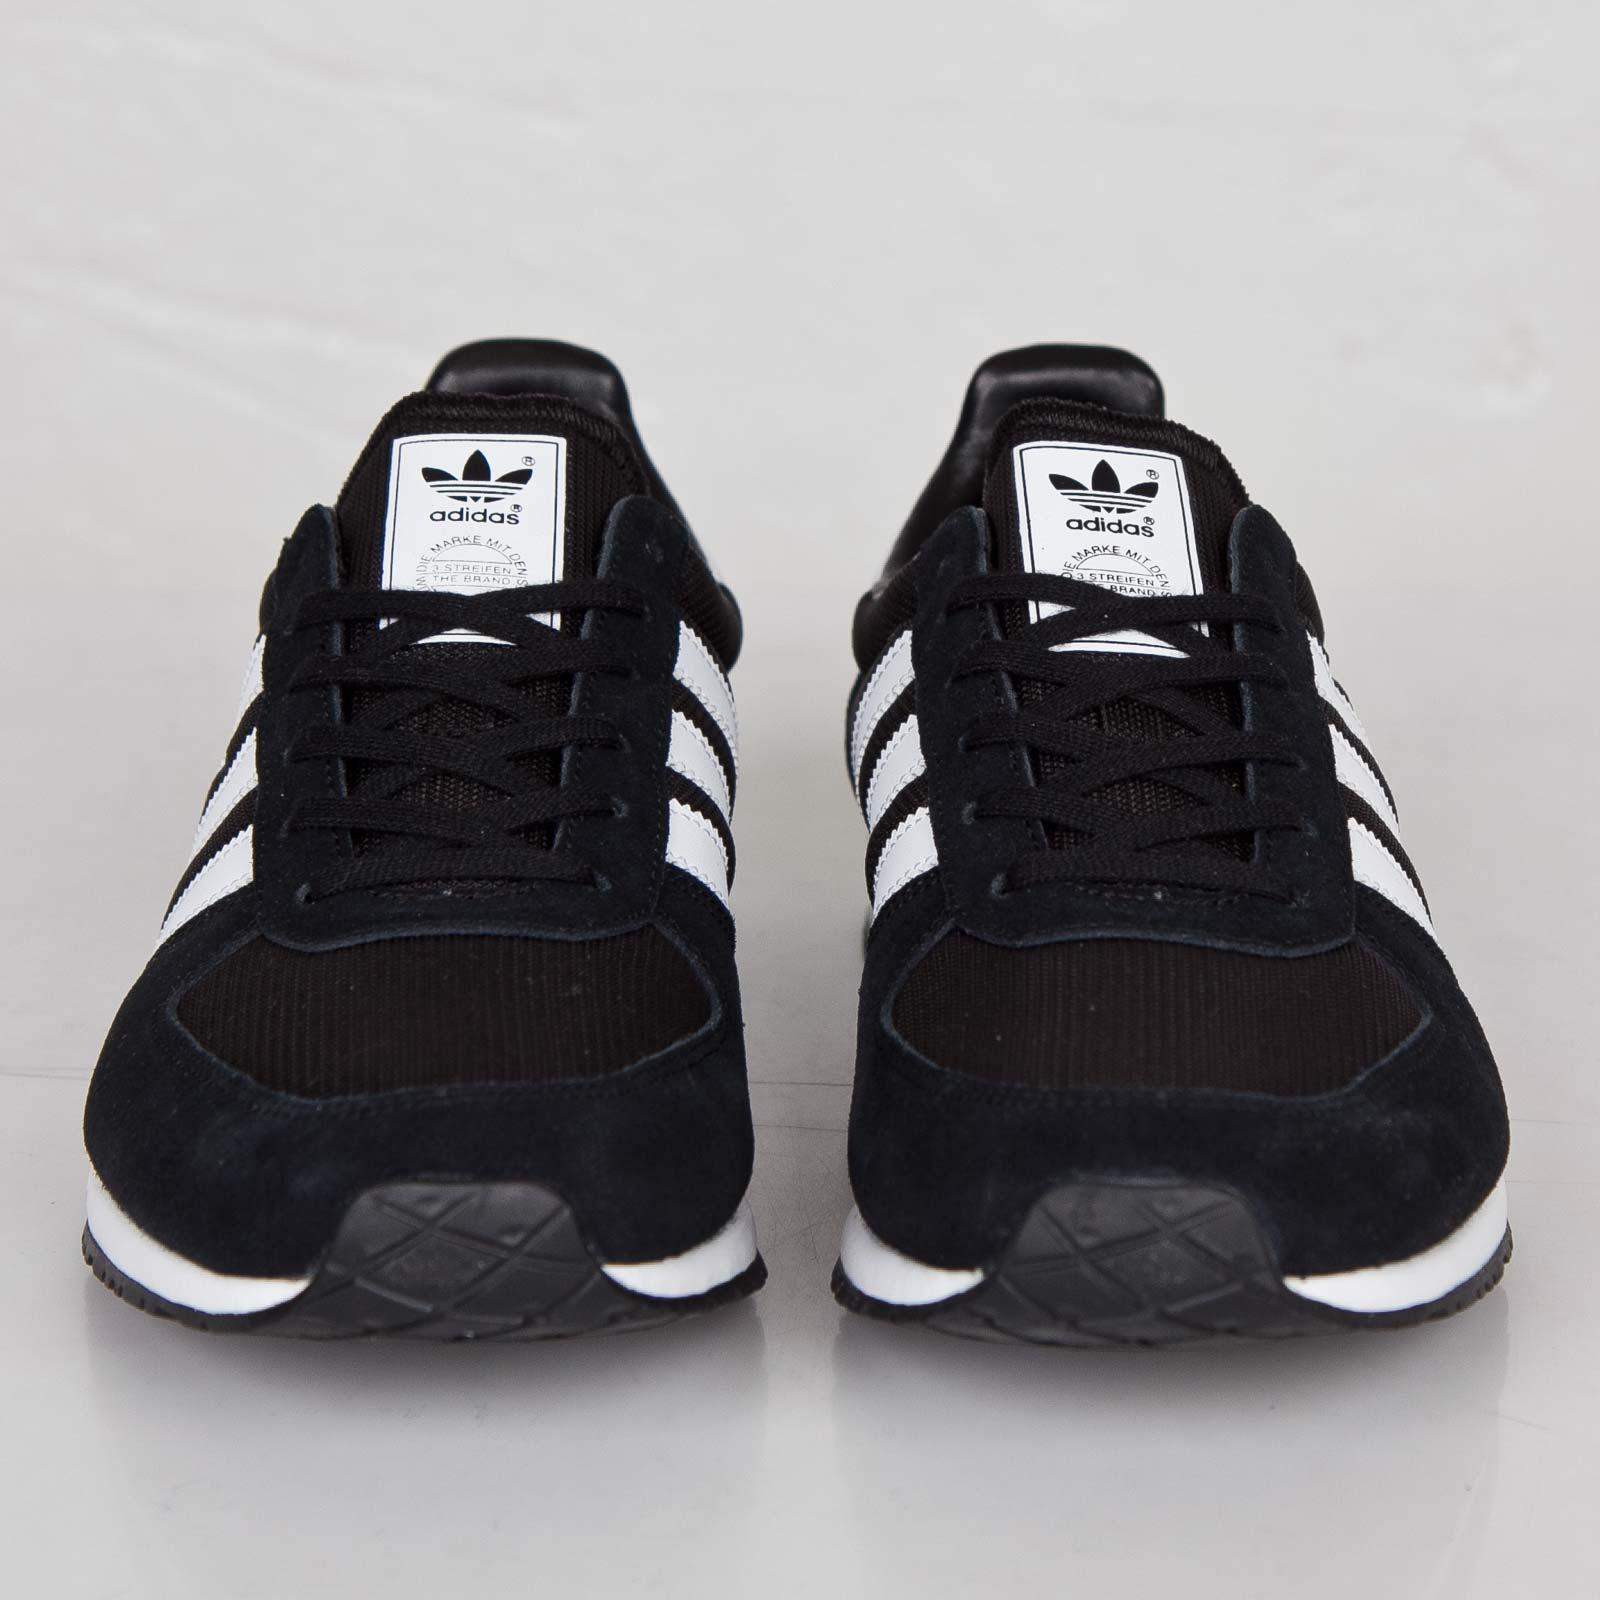 Nouveaux produits 8b8ac 4e119 adidas Adistar Racer - V22769 - Sneakersnstuff | sneakers ...